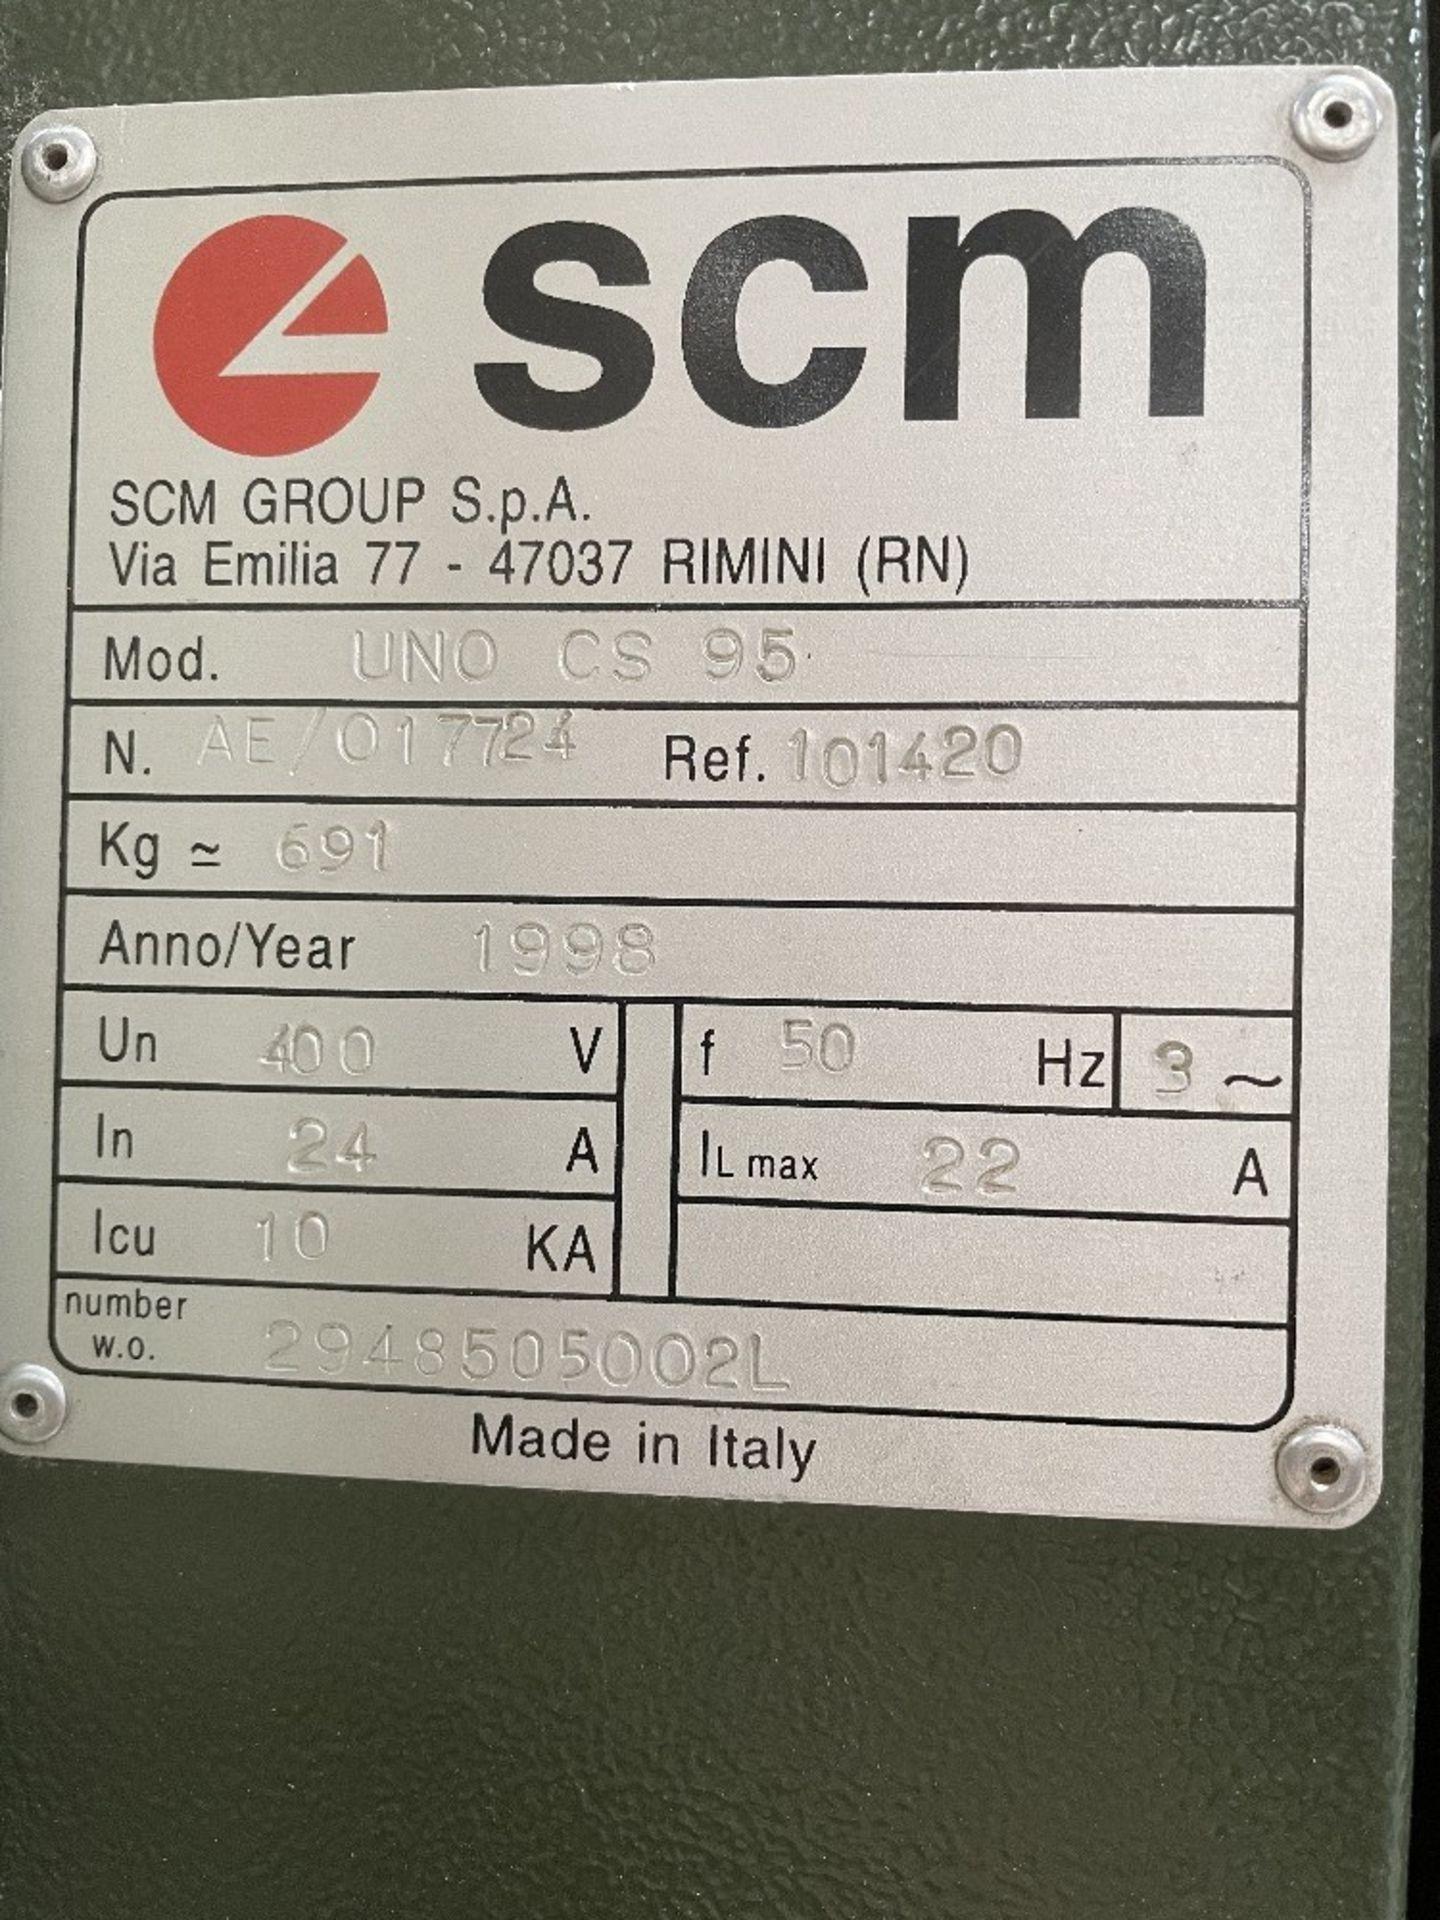 SCM Sandya 1K UNO CS 95 Drum Sander | YOM: 1998 - Image 3 of 7